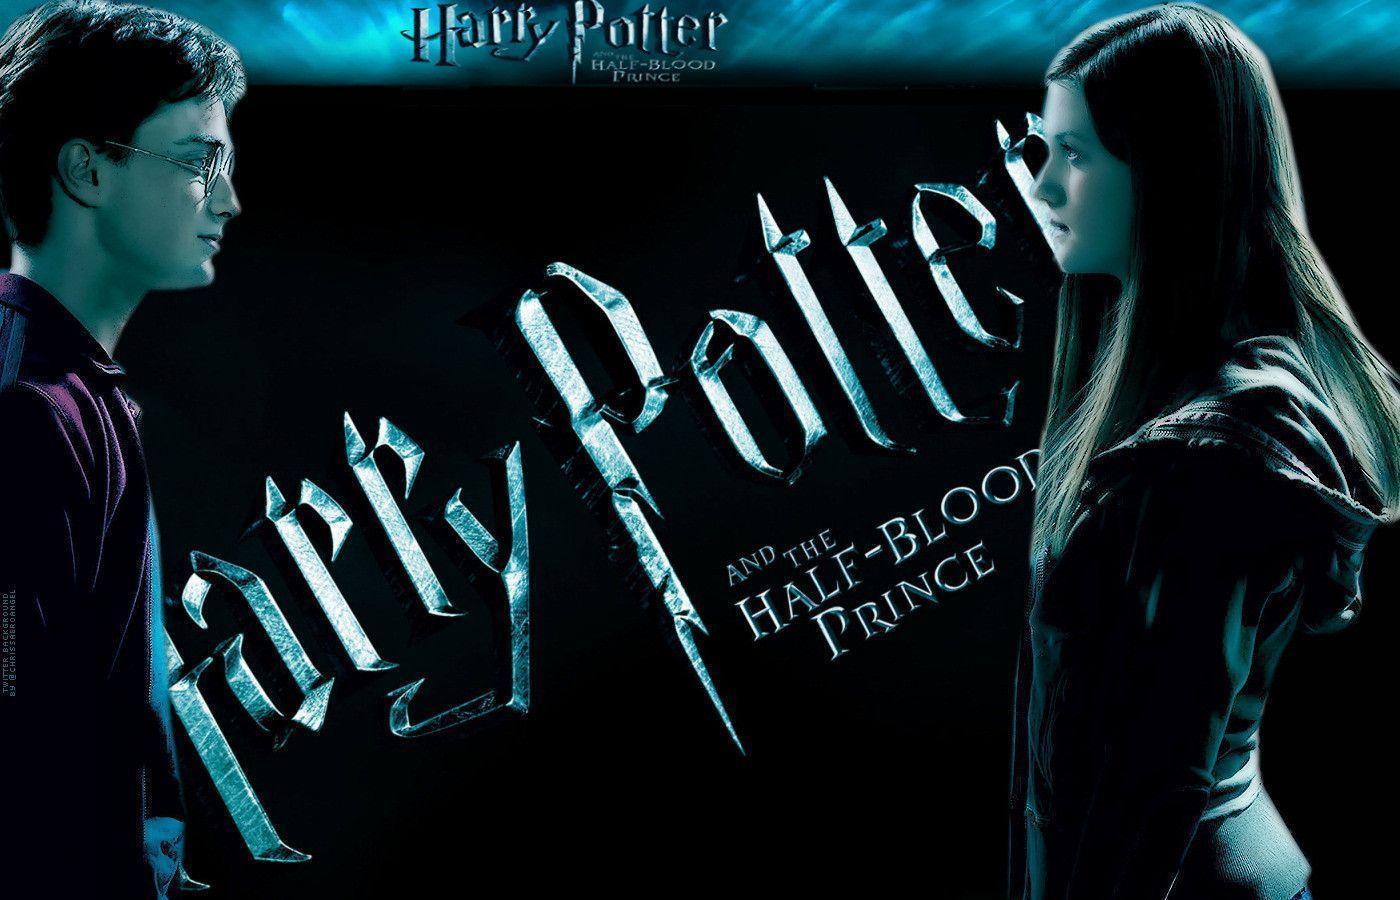 Download Wallpaper Harry Potter Twitter - FZvxlRc  Collection_20169.jpg